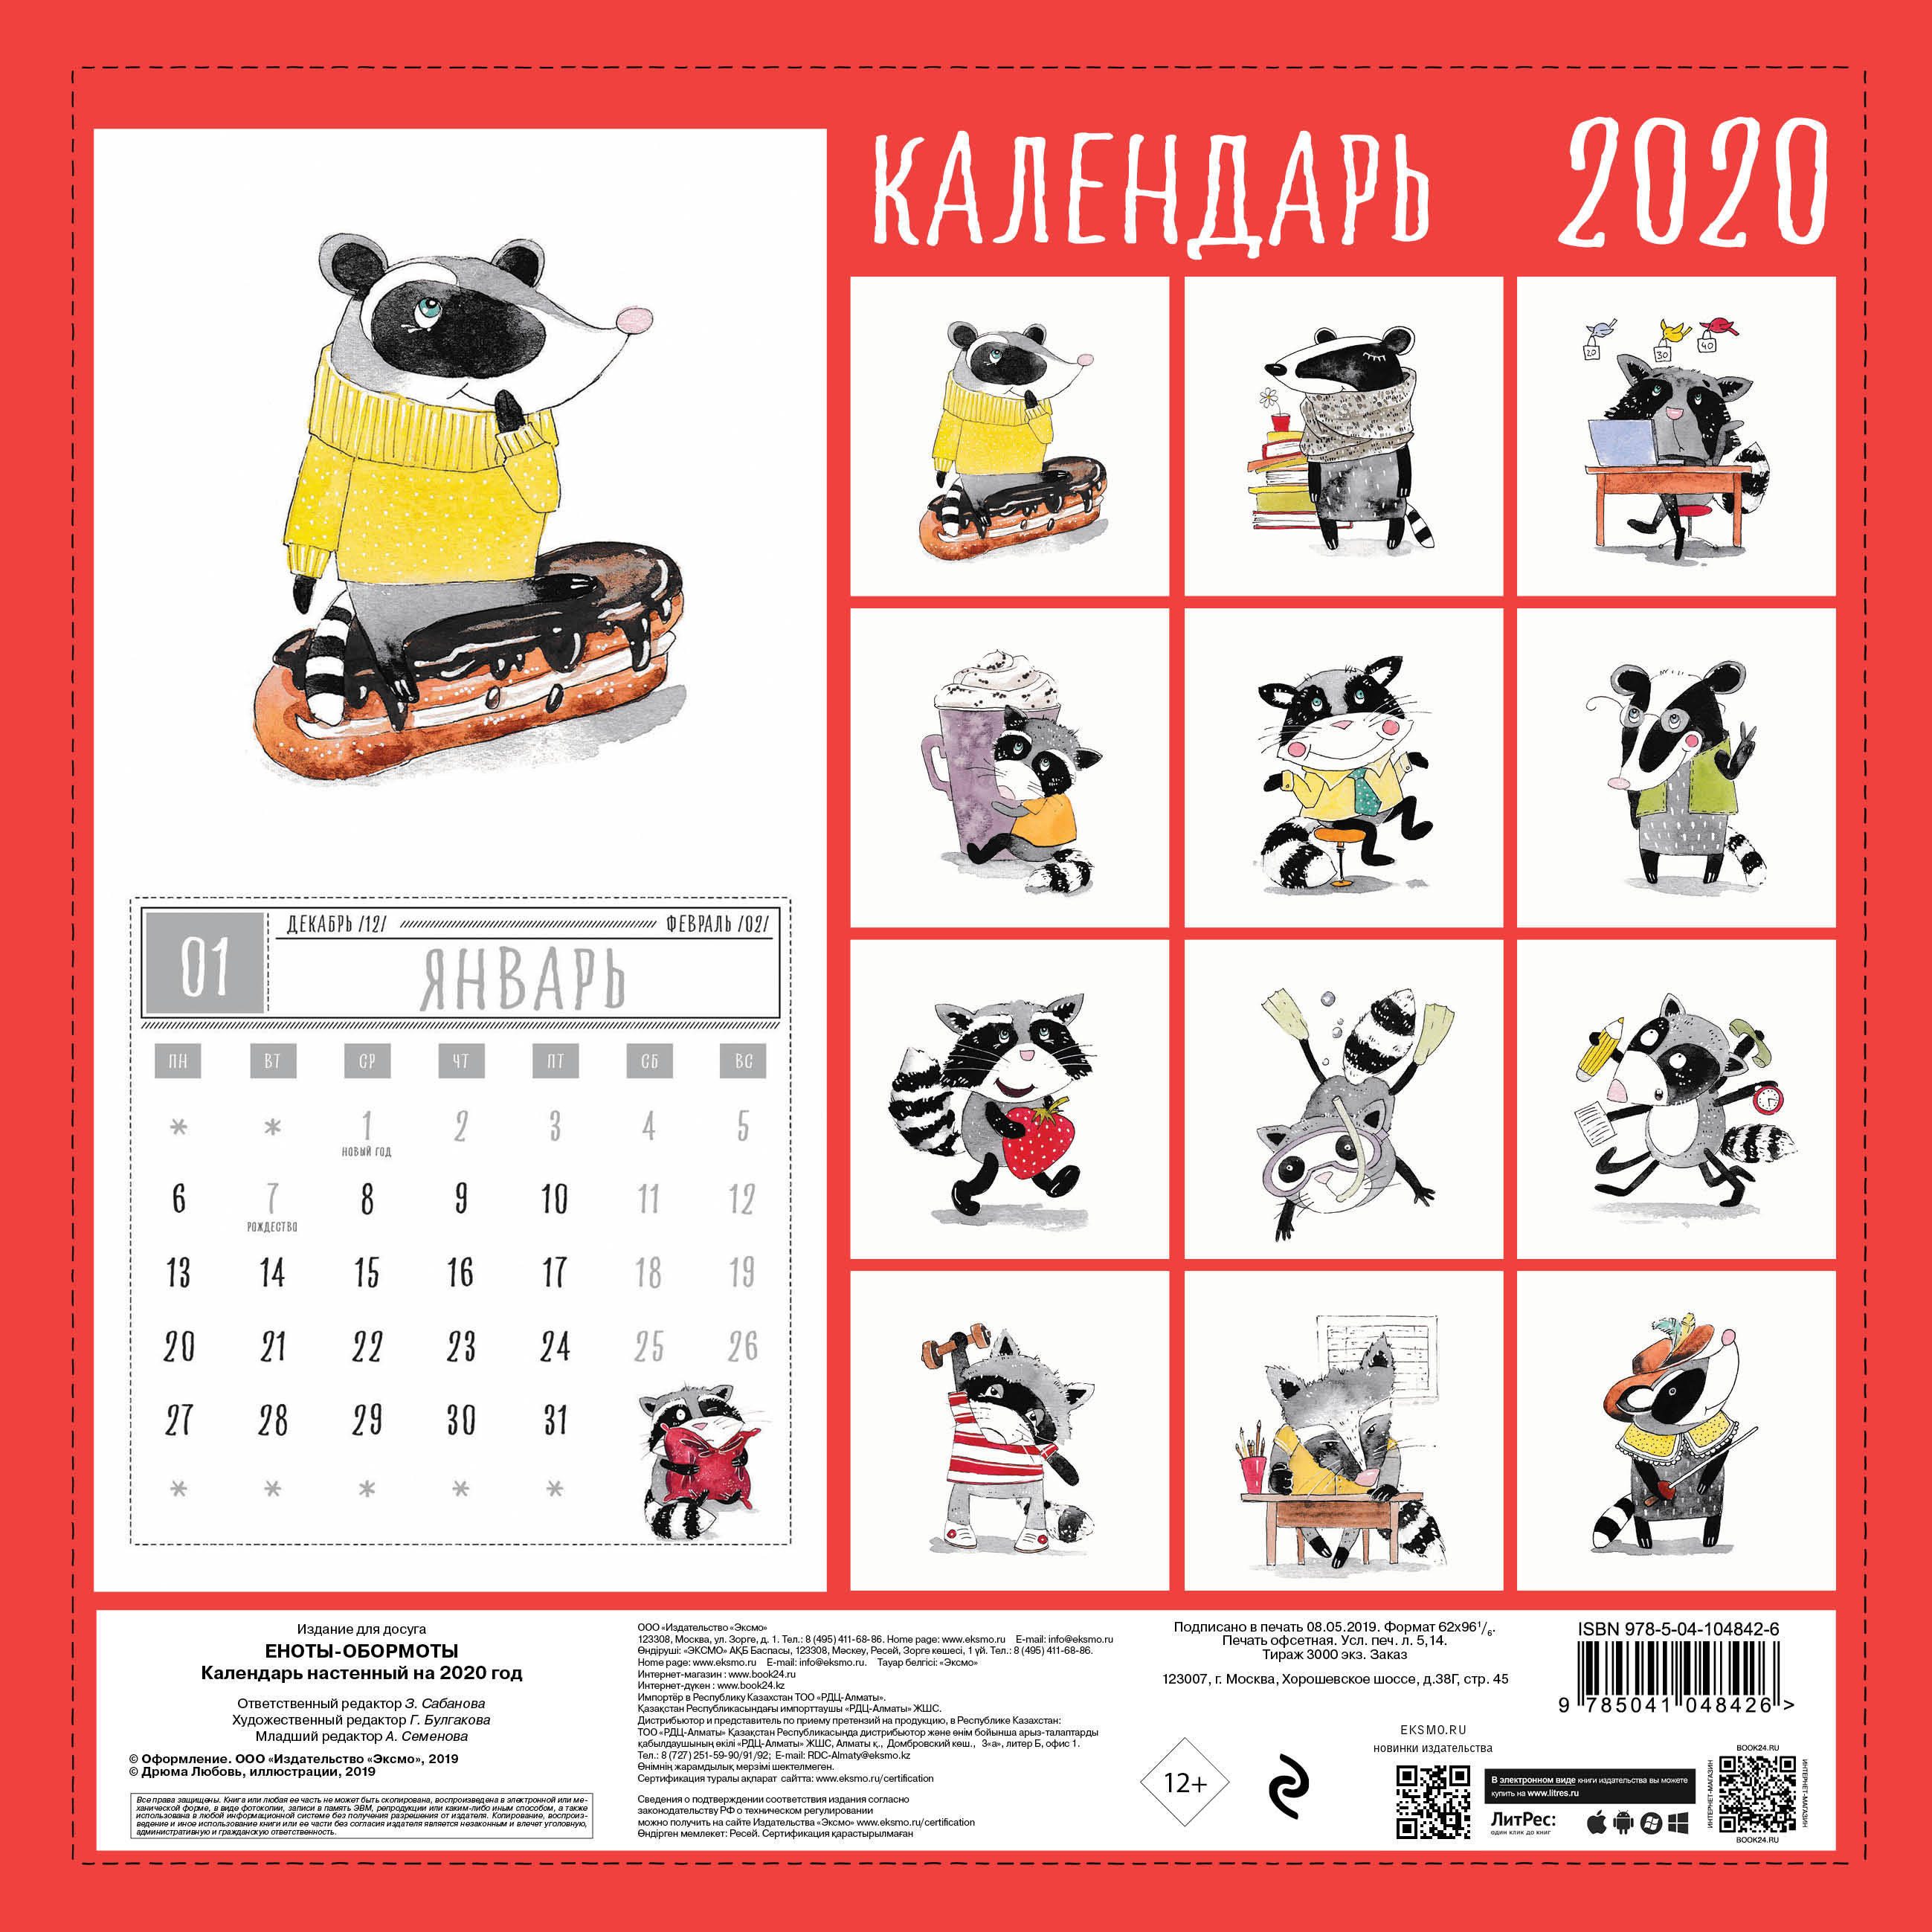 Еноты Обормоты. Календарь Настенный На 2020 Год Throughout Middlesex County College 2015 2020 Calendar